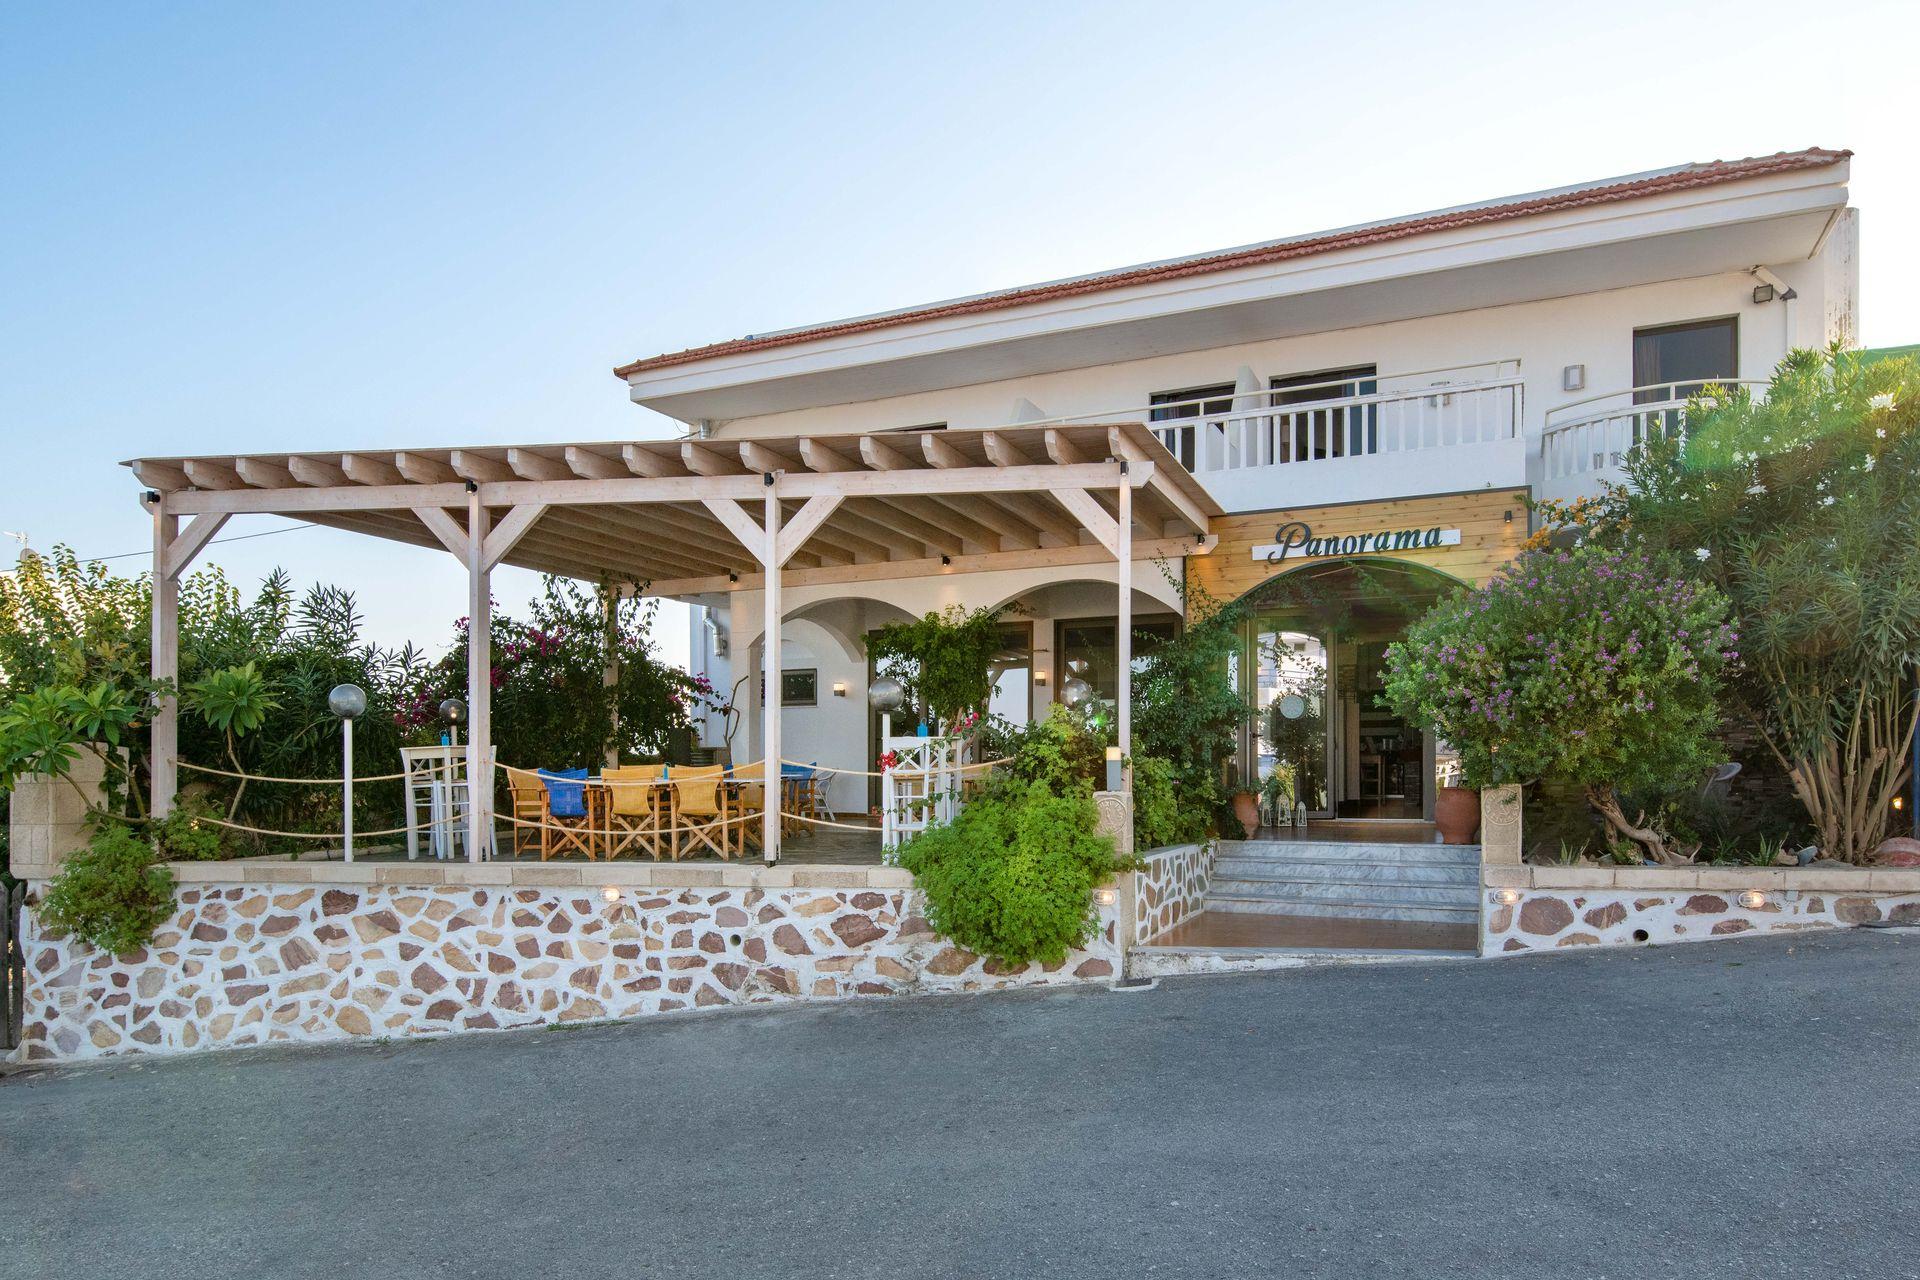 Panorama Gennadi Guest House & Bistrot - Γεννάδι